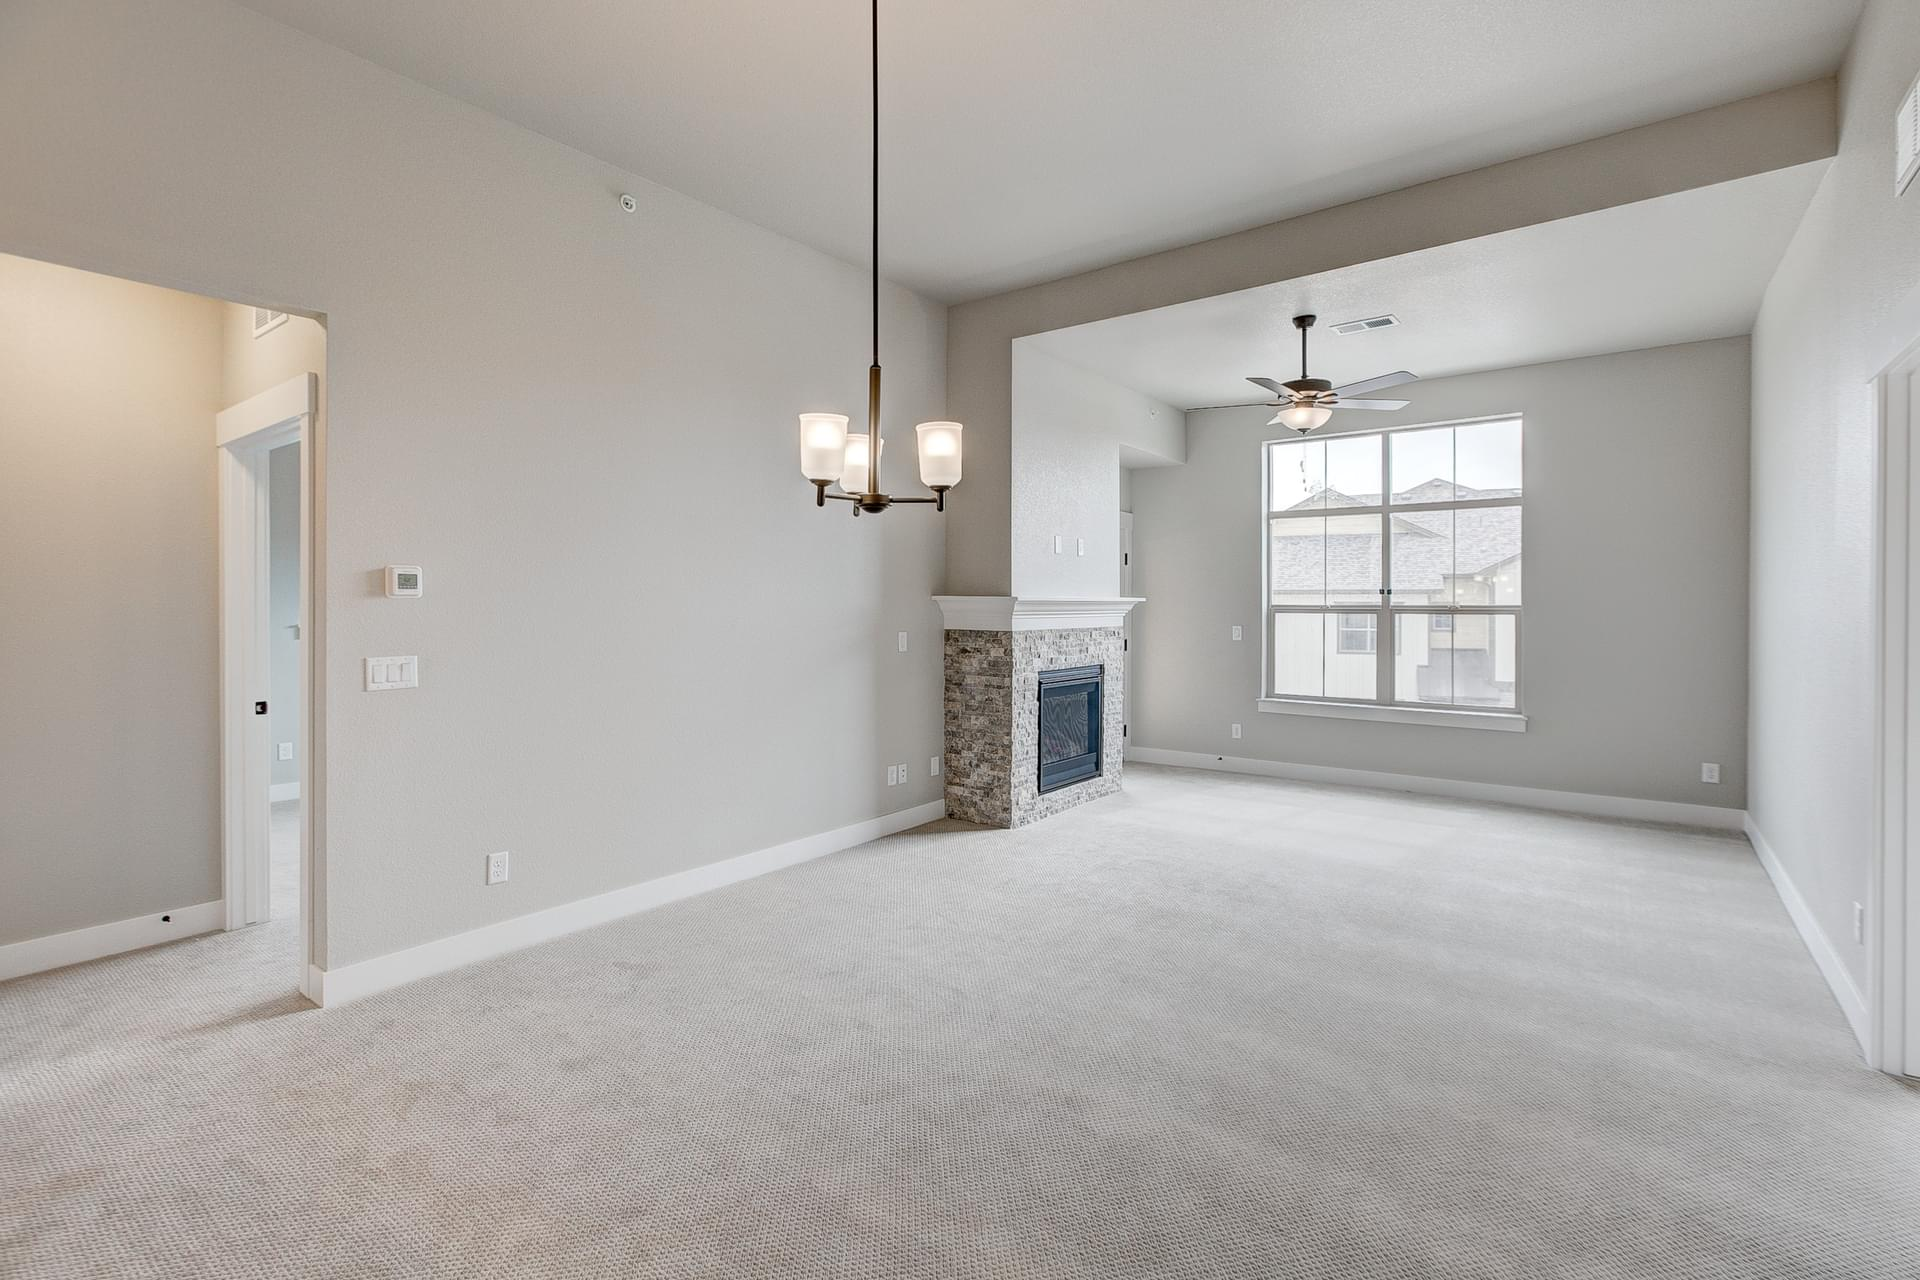 Living Room - Previous Oxford Floor Plan